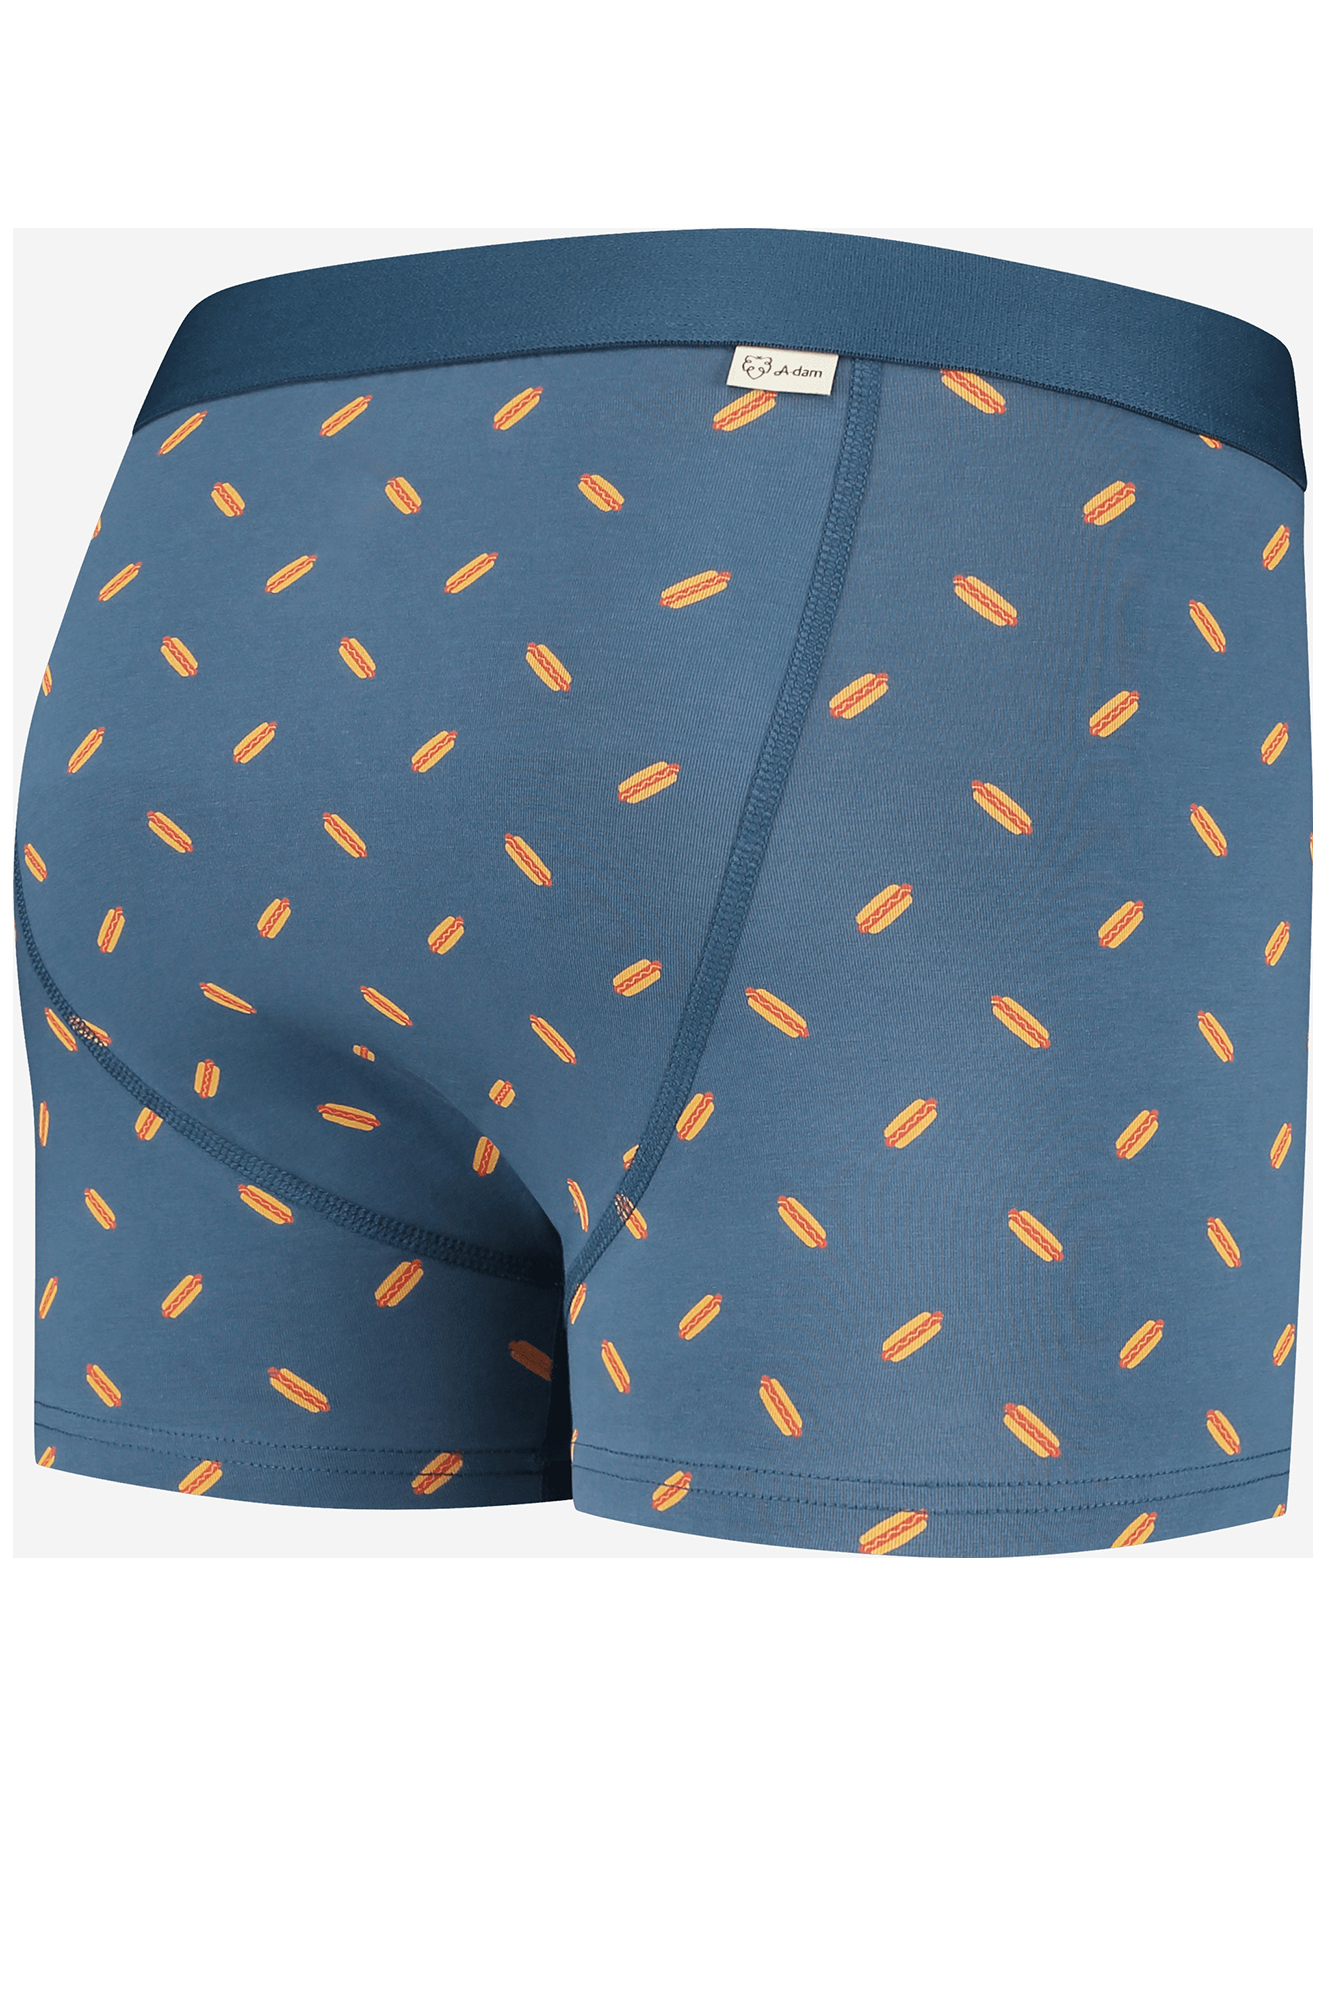 Adam Boxer Briefs Rufus Hot Dog